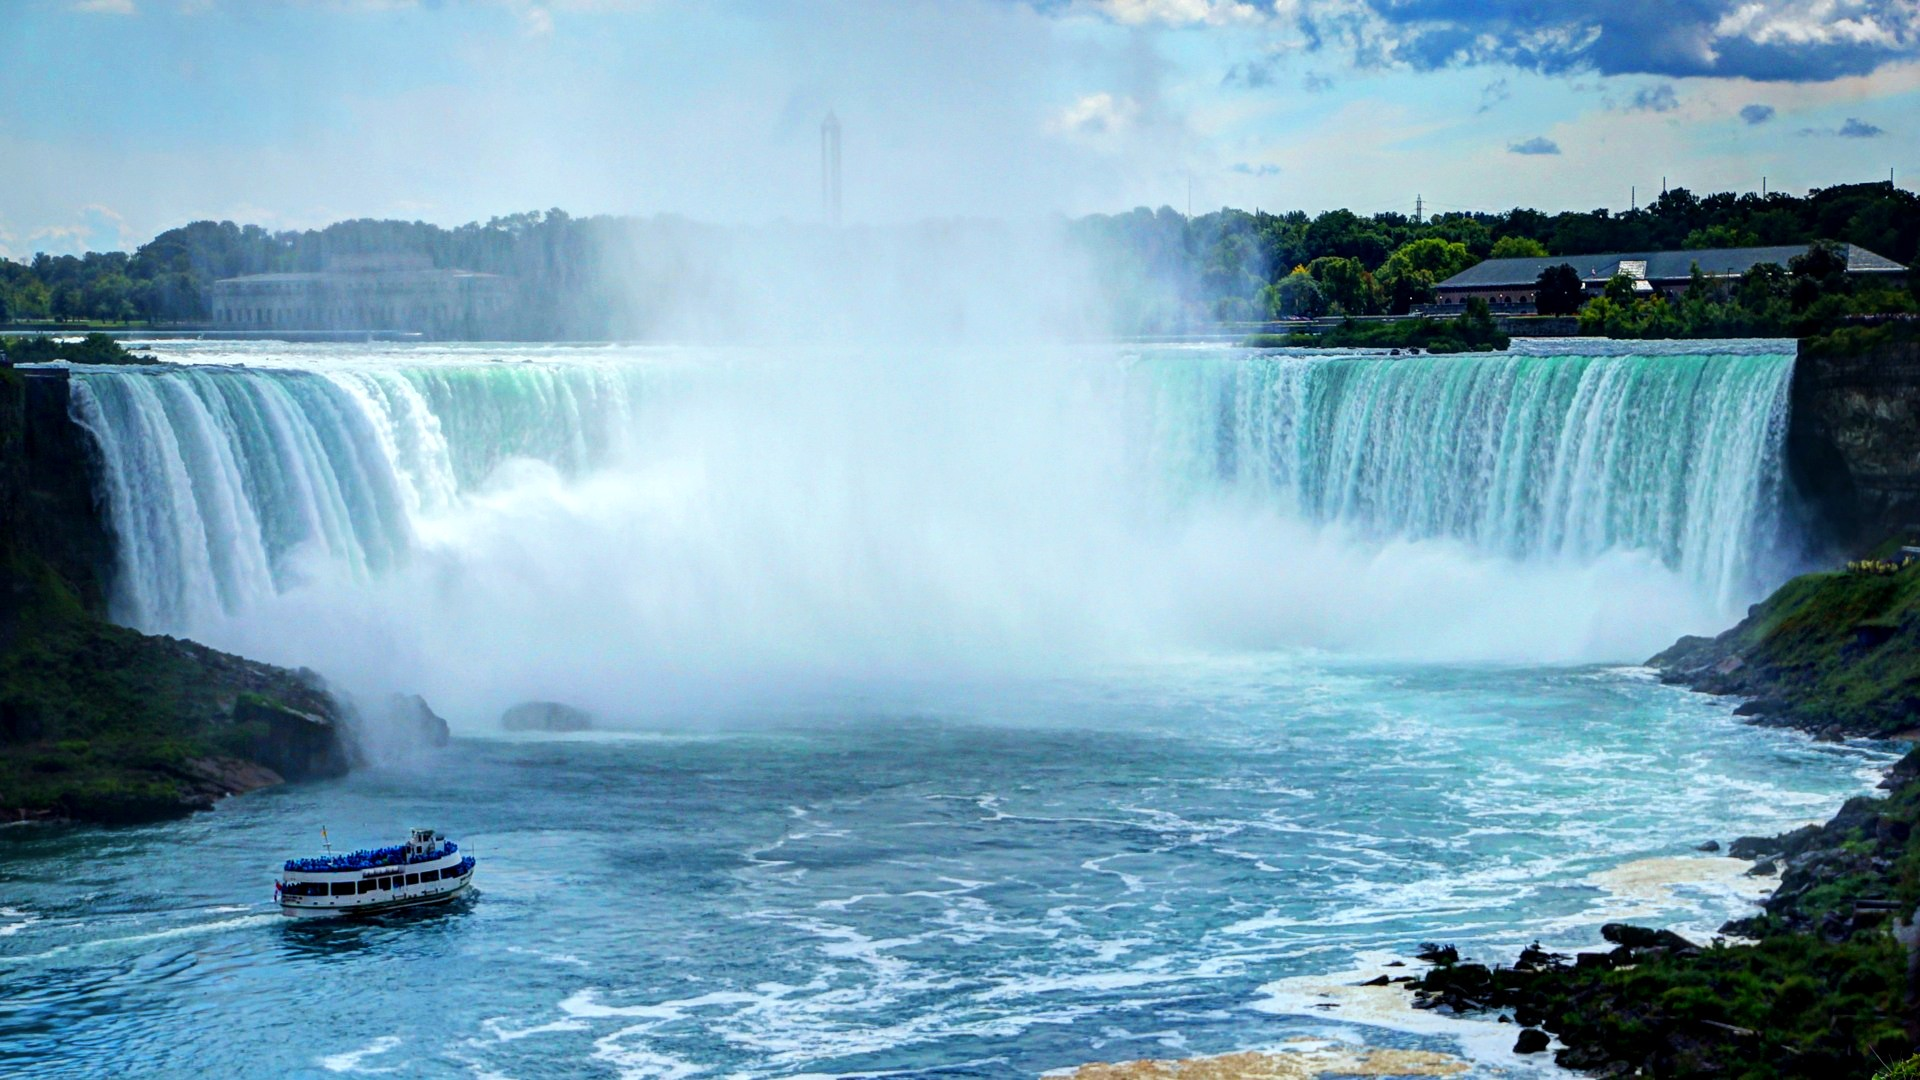 Niagara Falls Wallpapers 11313 Wallpaper Wallpaper hd 1920x1080